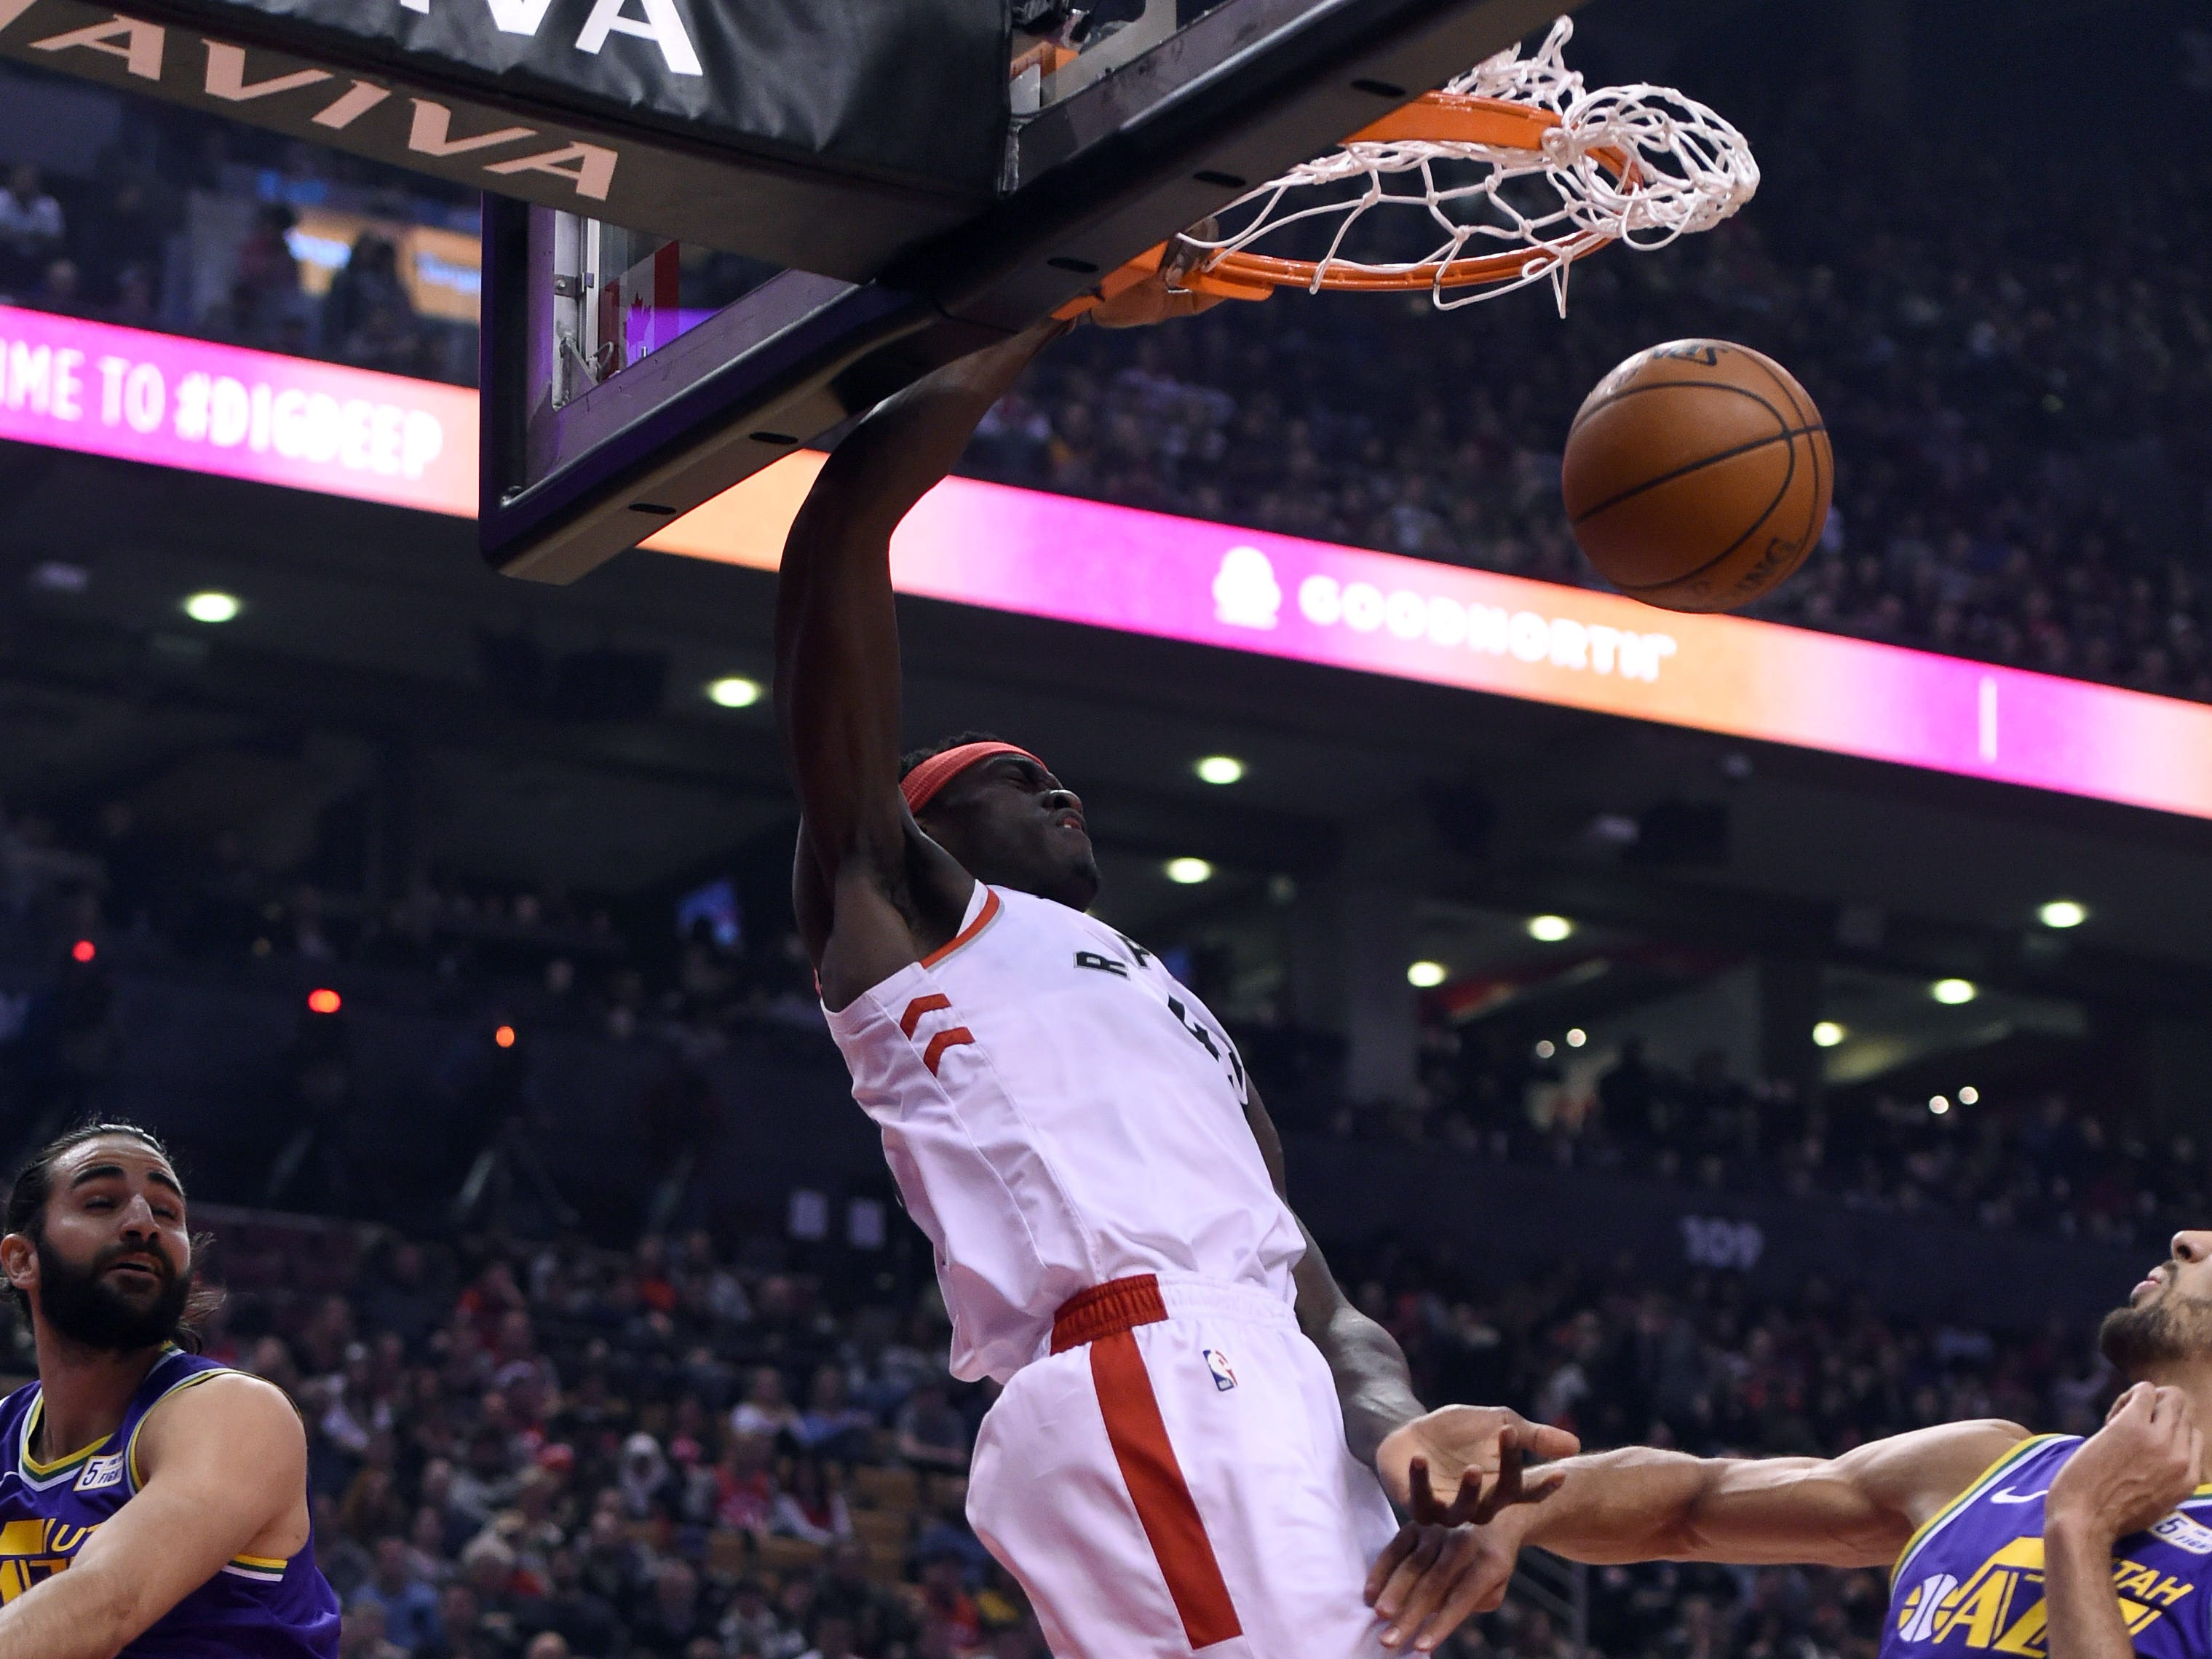 Jan. 1: Toronto Raptors forward Pascal Siakam dunks against Utah Jazz in the first half at Scotiabank Arena.